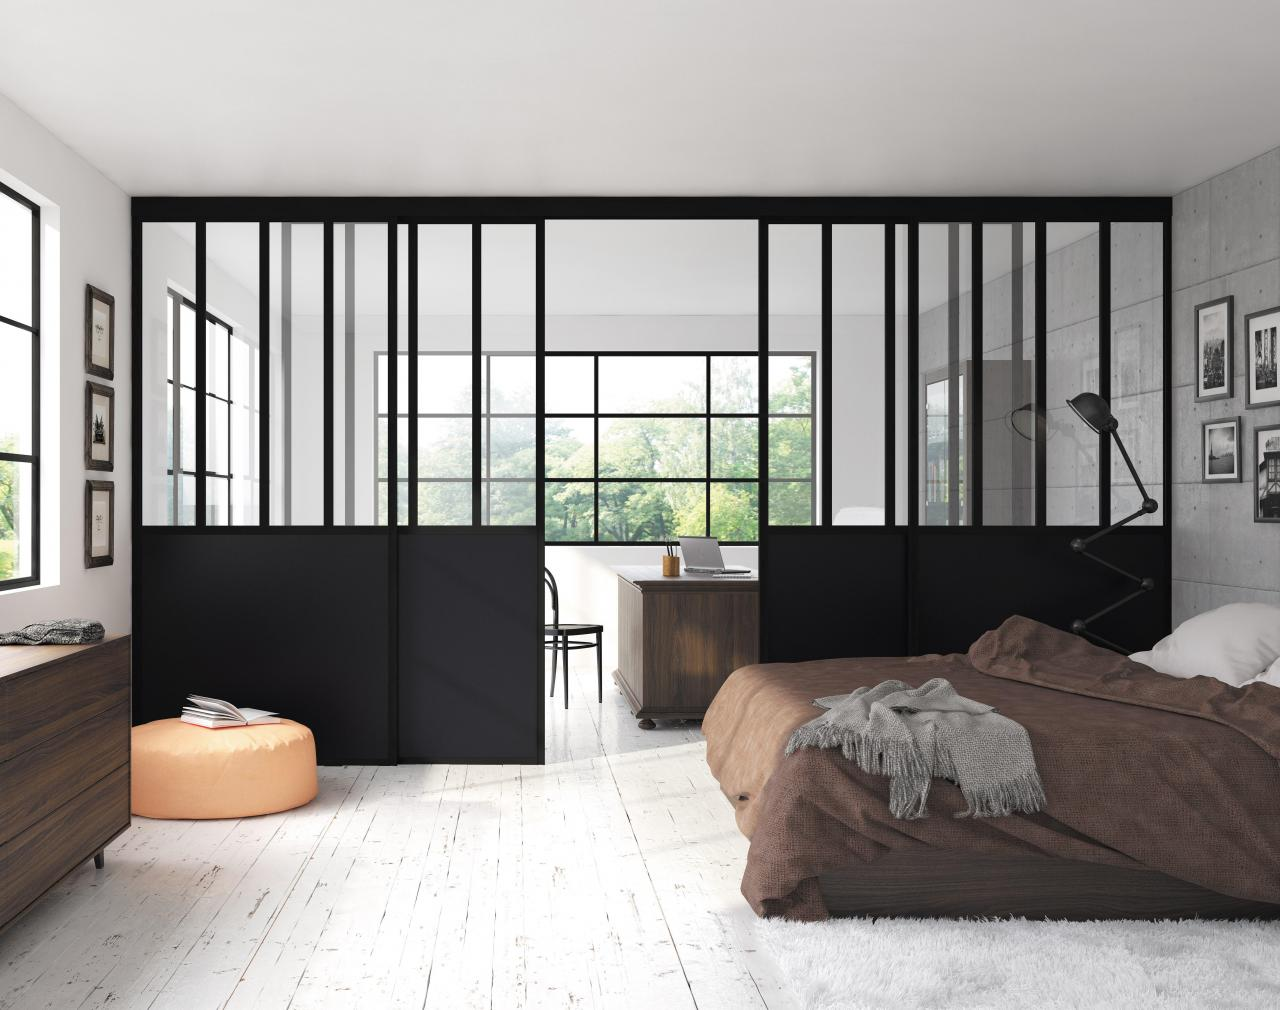 verri re int rieure 7 fa ons de cloisonner son espace tanguy. Black Bedroom Furniture Sets. Home Design Ideas